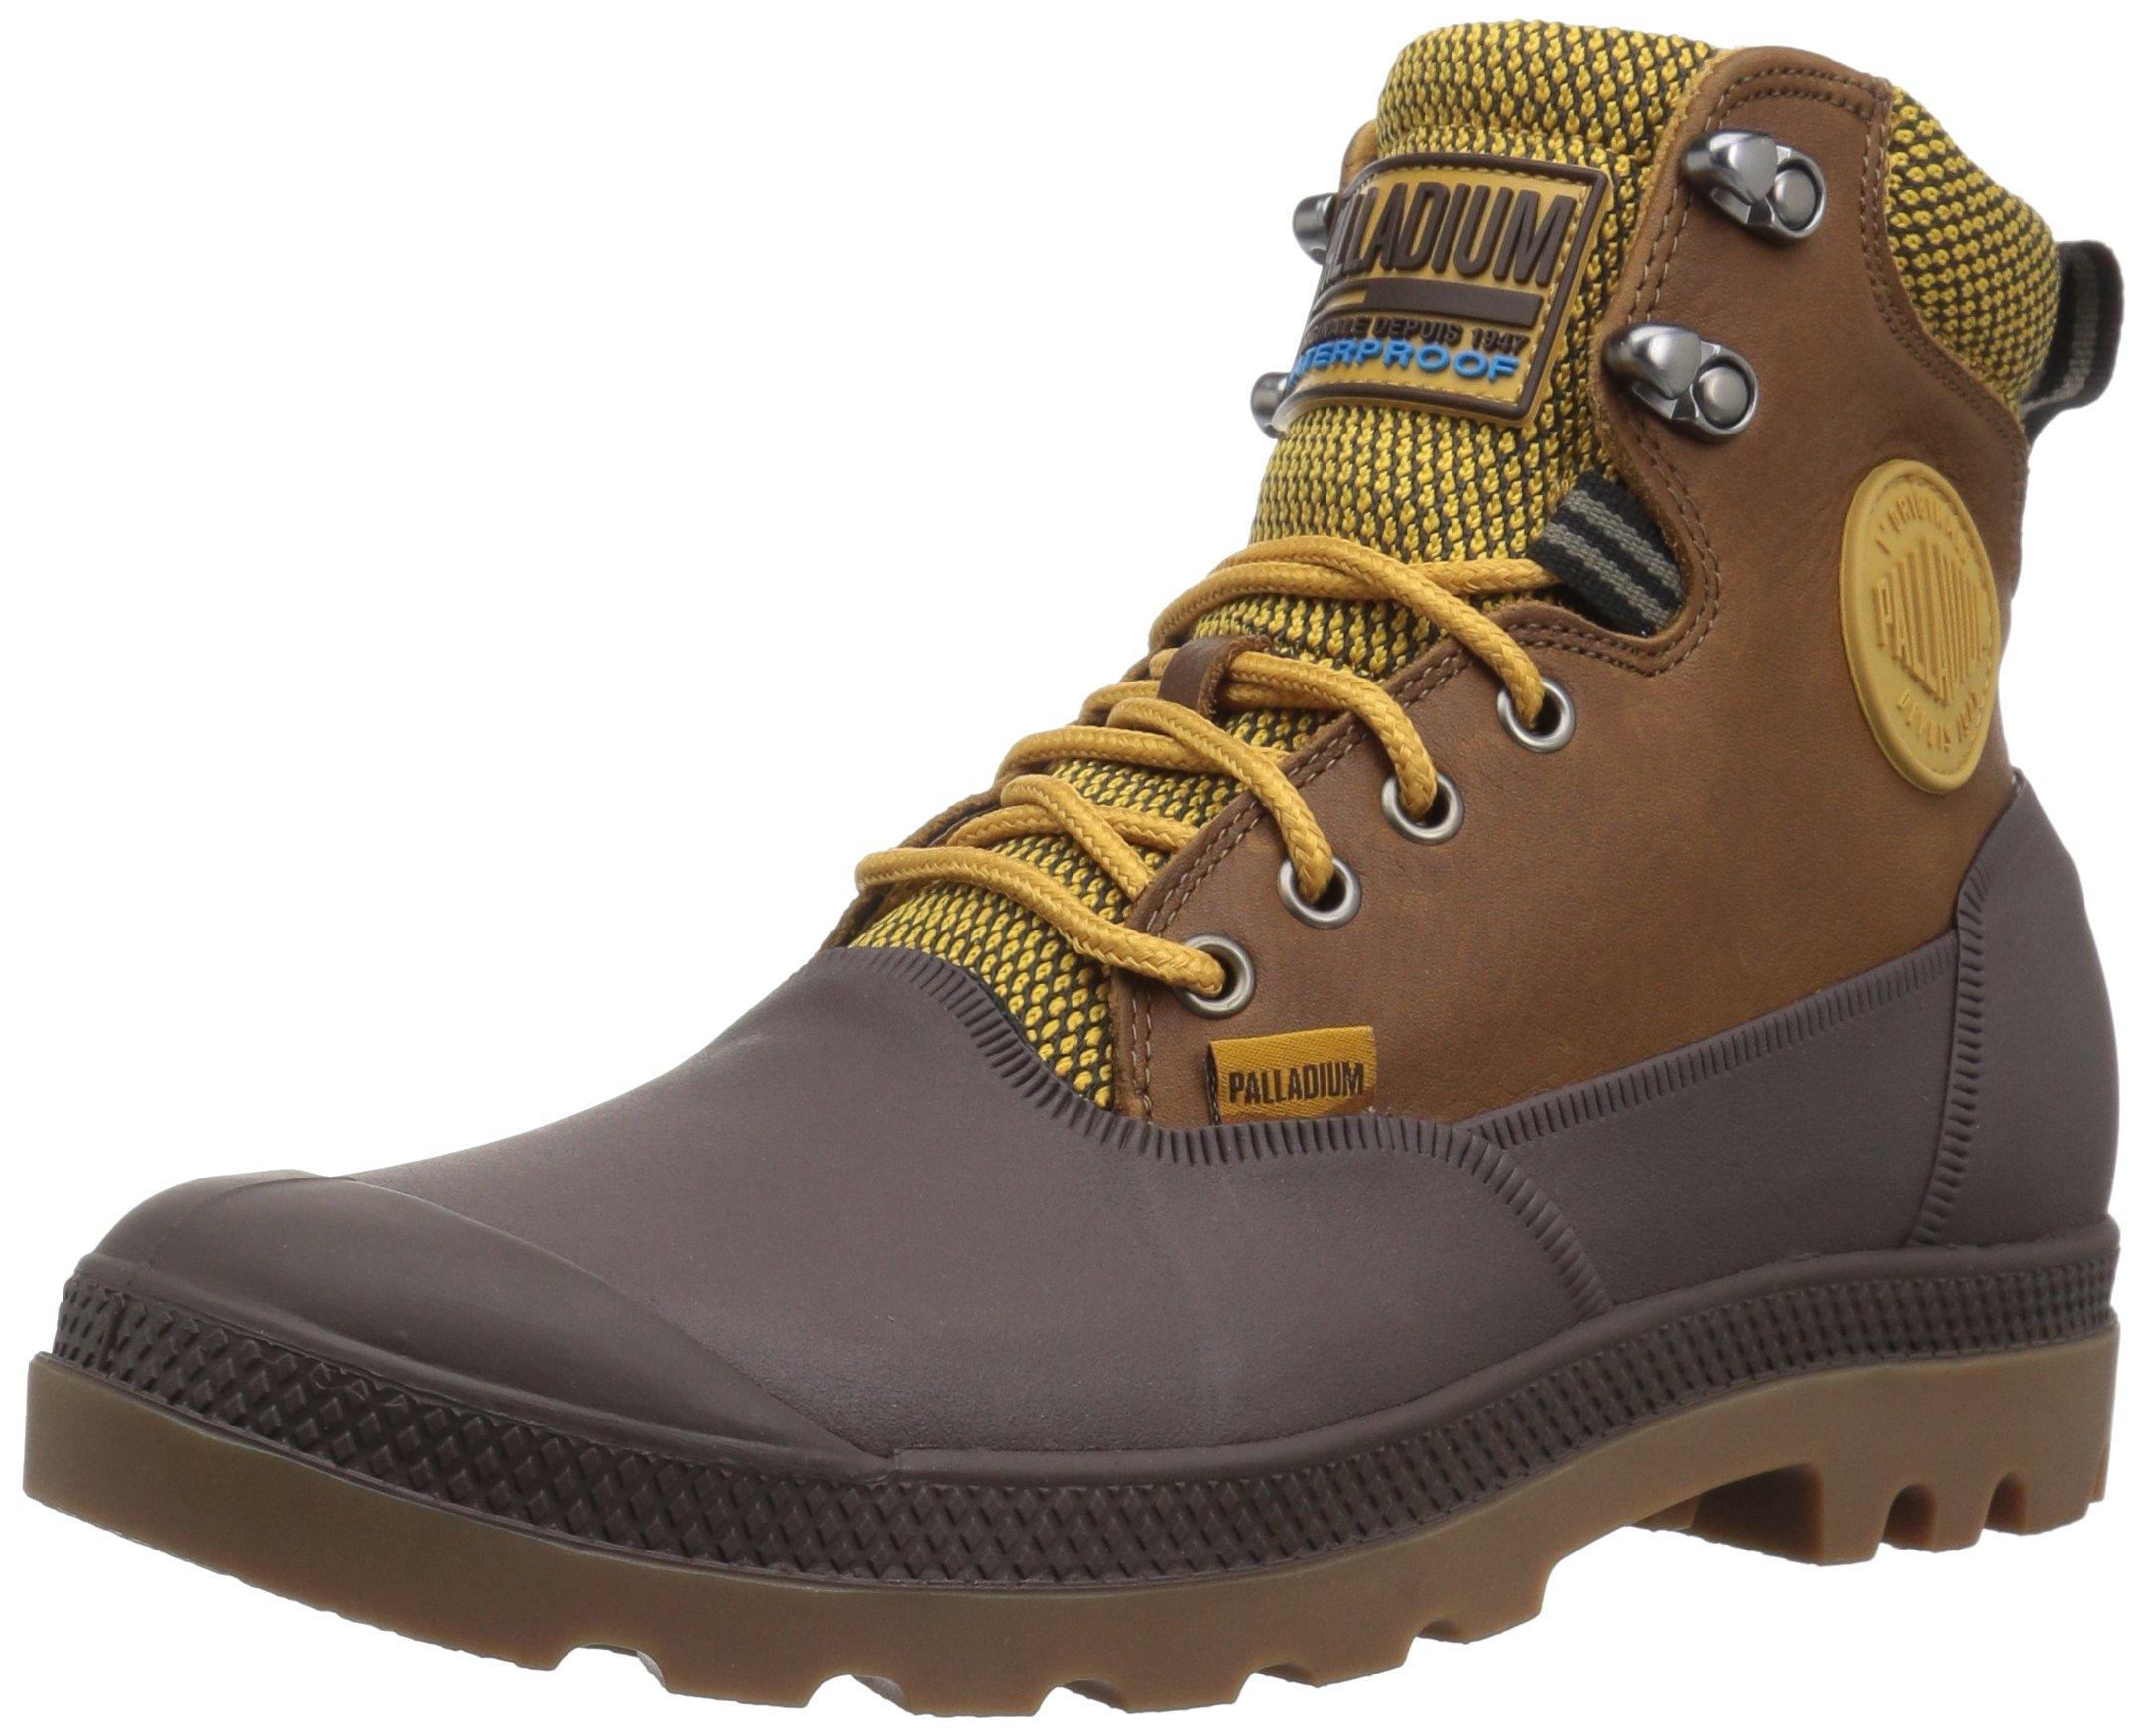 Palladium Men's Sport Cuff Wp 2.0 Rain Boot, Amber Gold/Chocolate, 10.5 M US